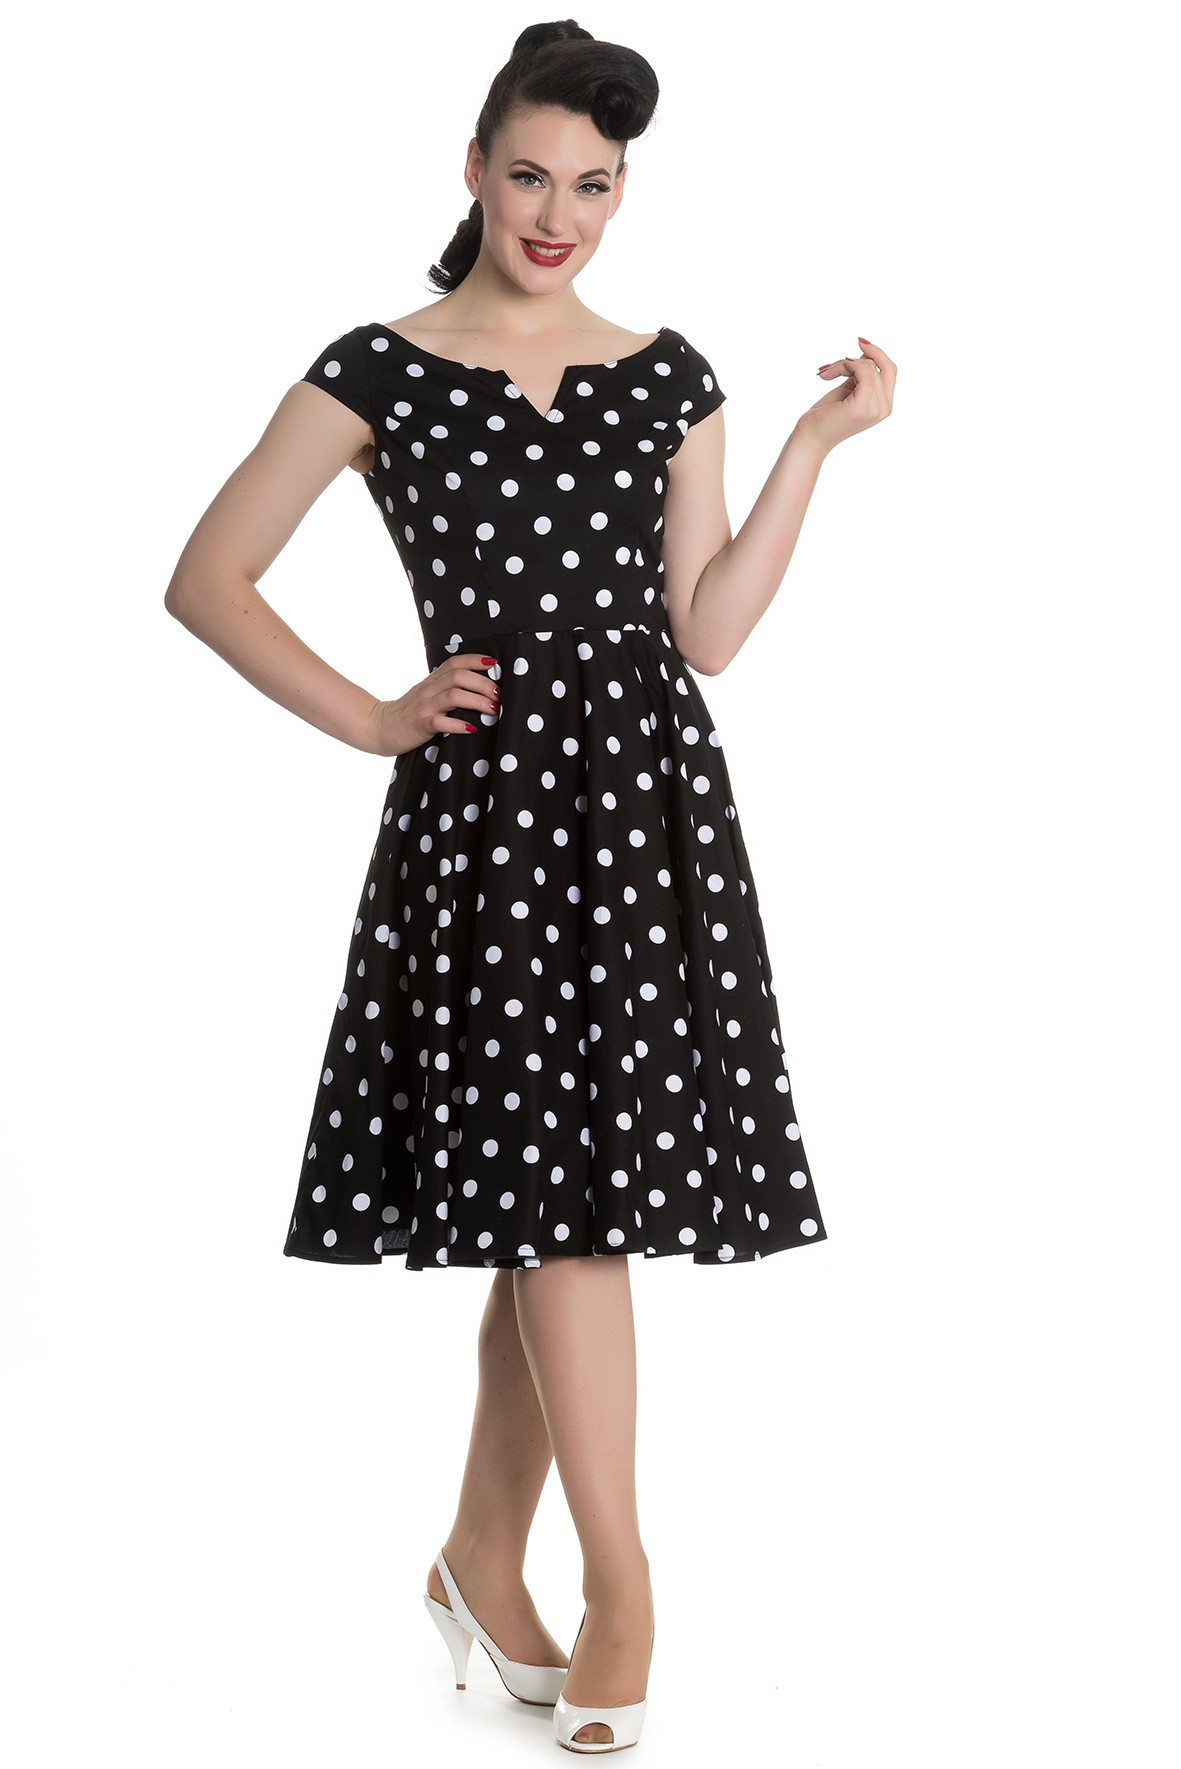 nicky 50s retro polka dots swing petticoat kleid v hell bunny frauen kleider. Black Bedroom Furniture Sets. Home Design Ideas